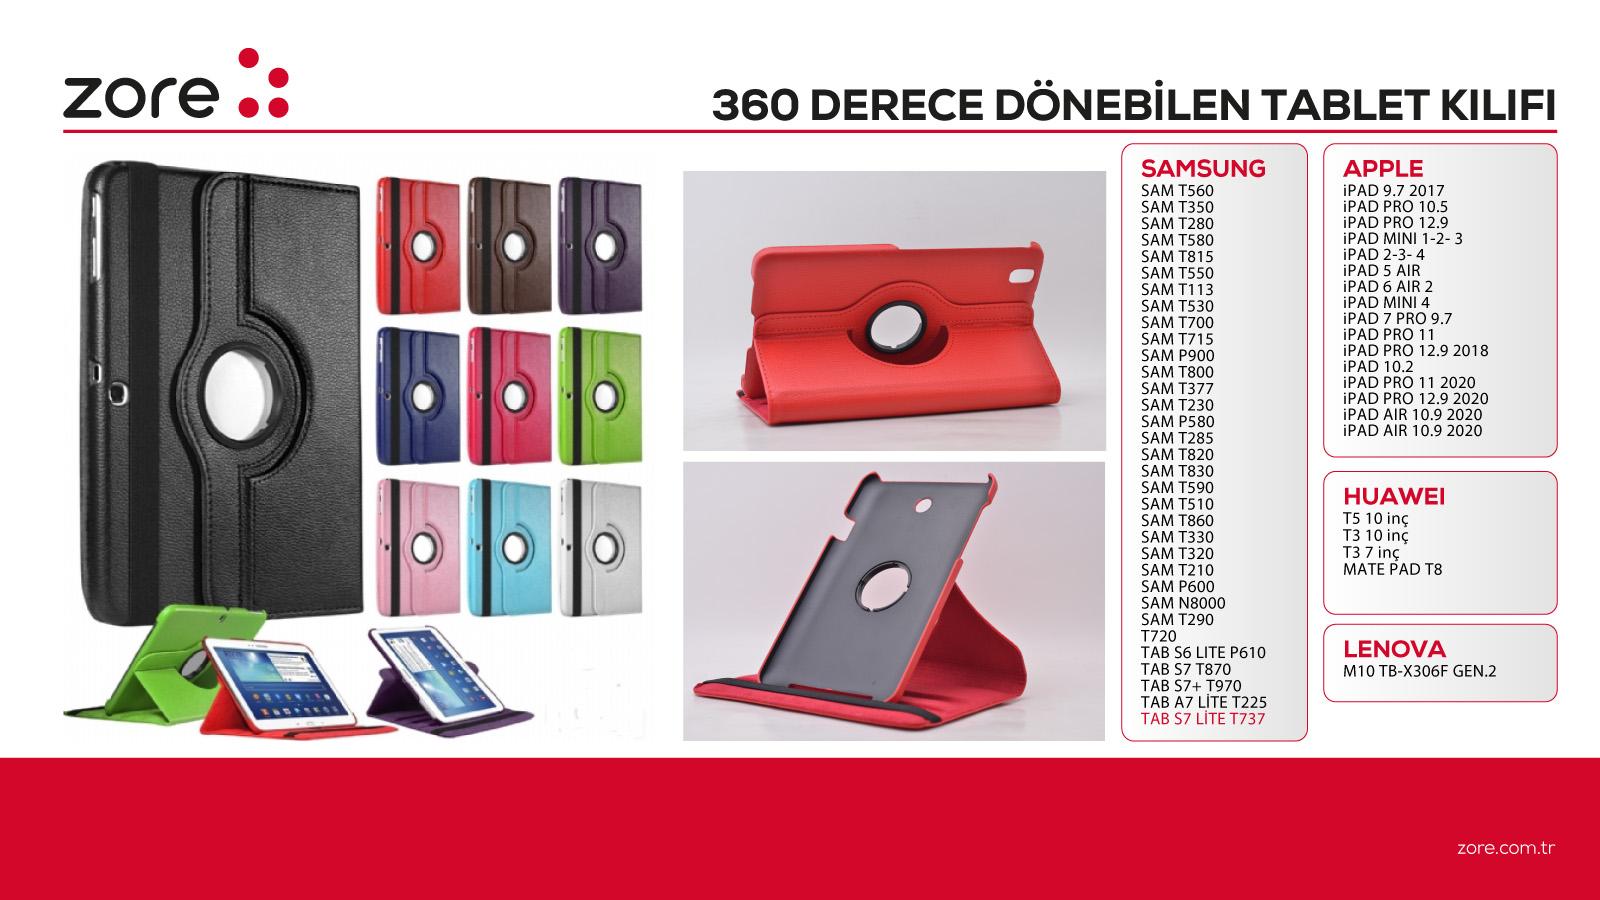 360_derece_donebilen_tablet_kilifi.jpg (317 KB)